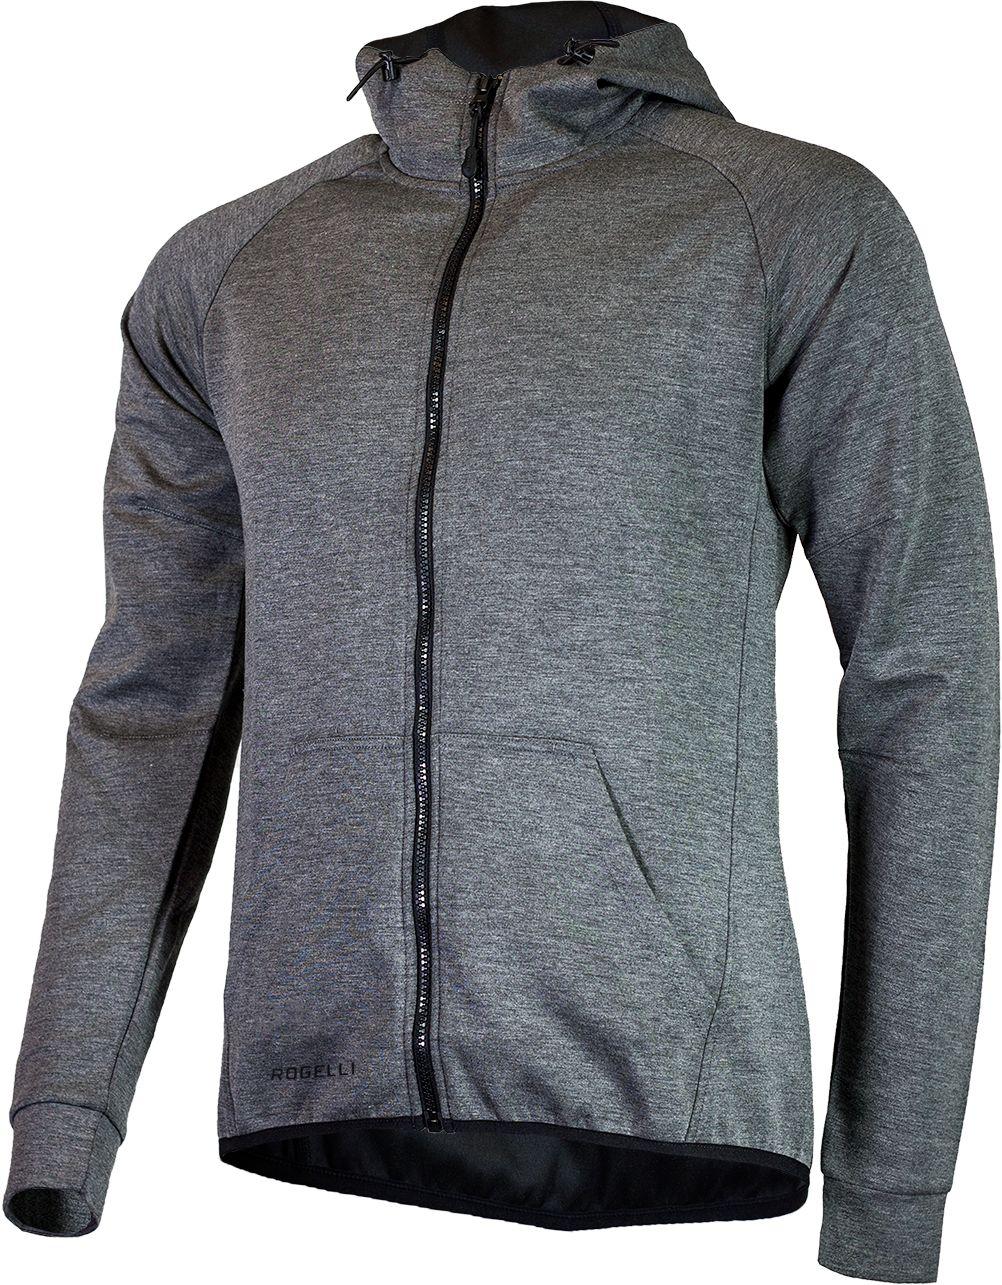 ROGELLI bluza męska z kapturem TRENING grey Rozmiar: XL,050.600.XL